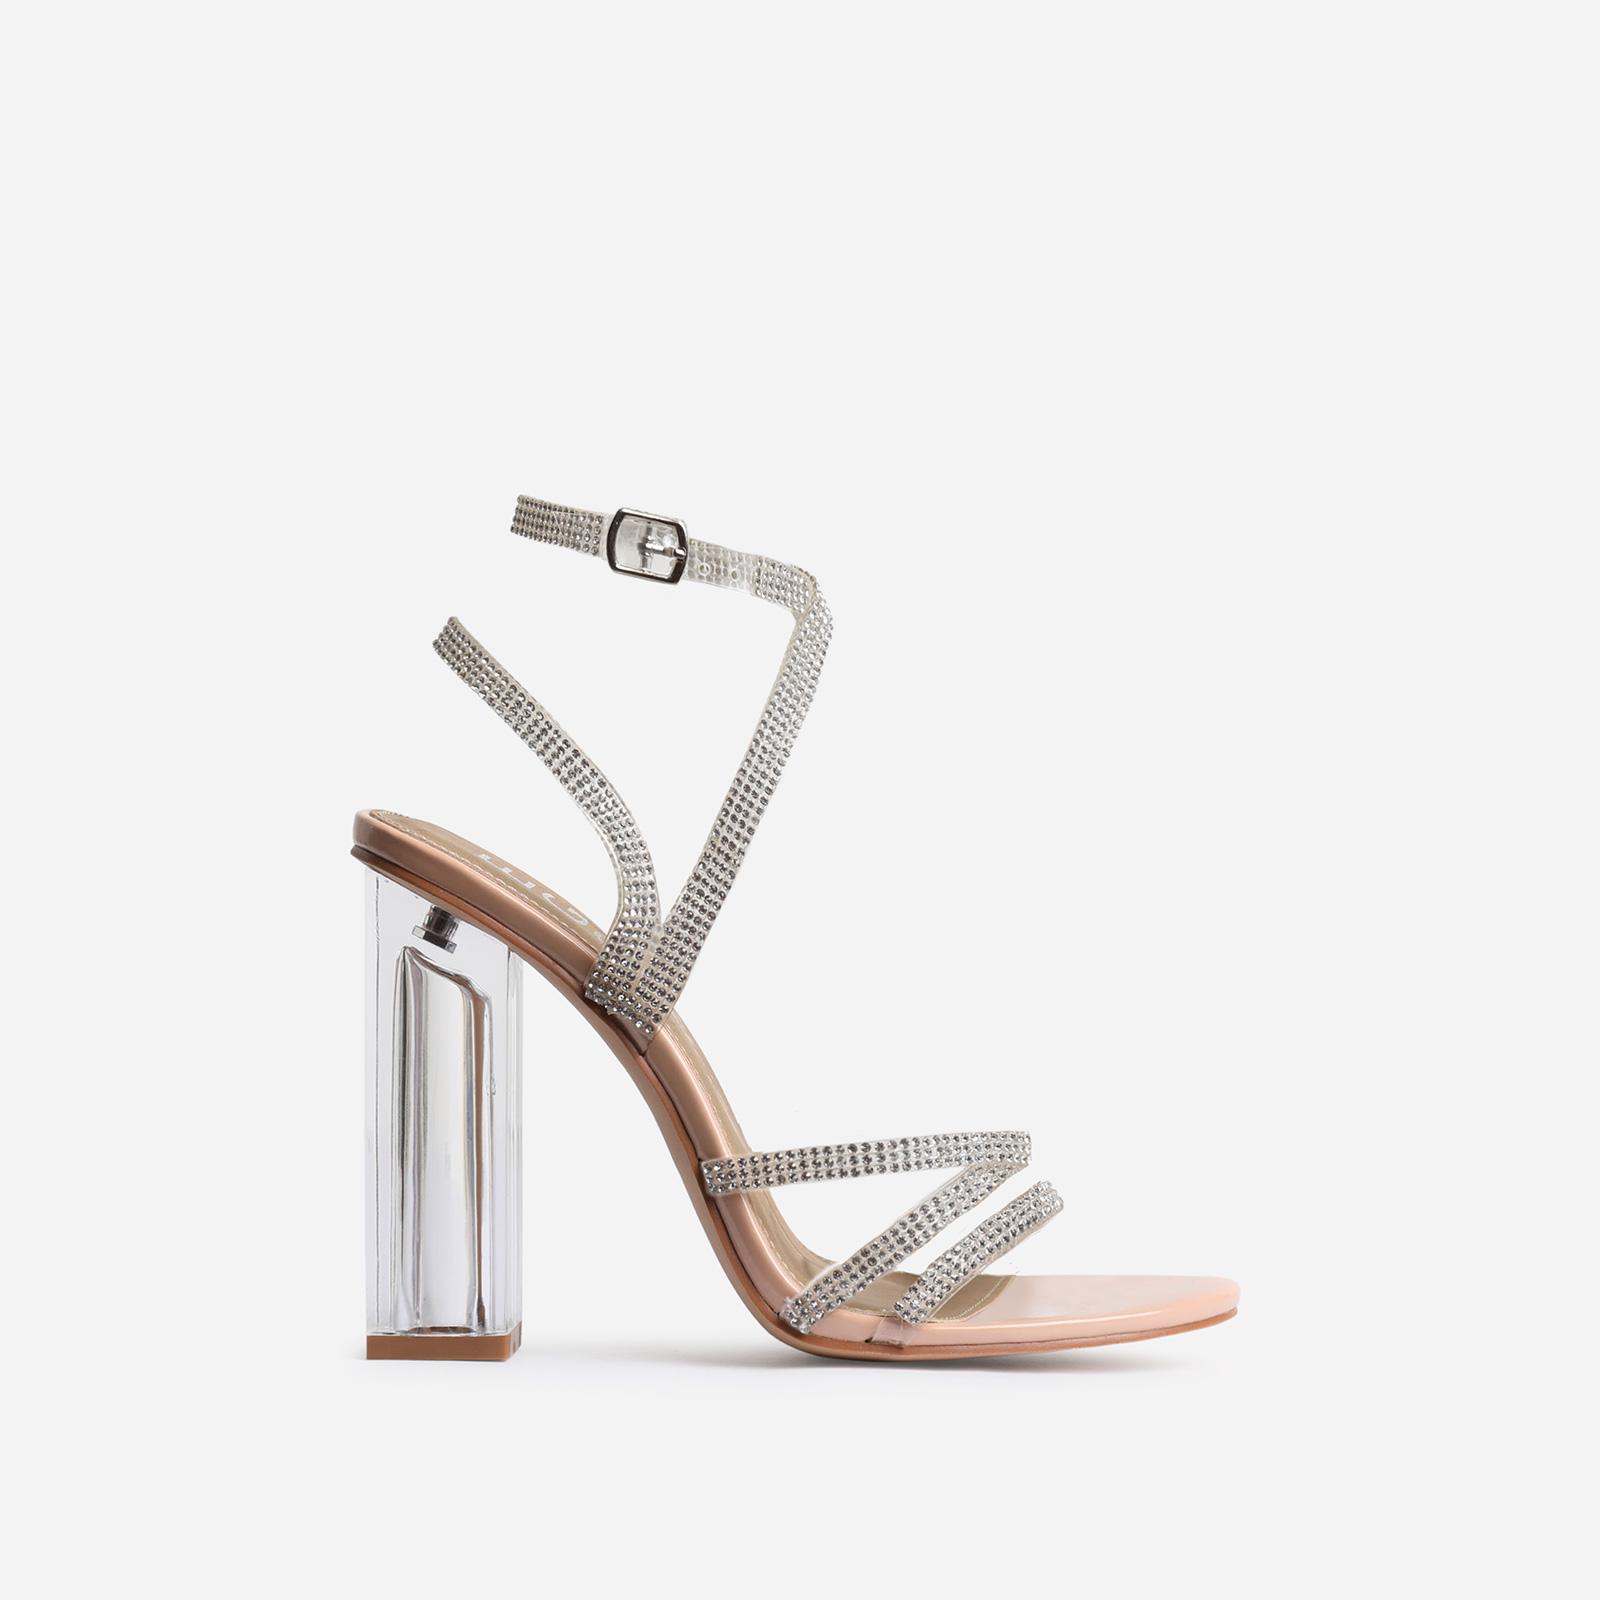 Dash Diamante Detail Perspex Block Heel In Nude Patent